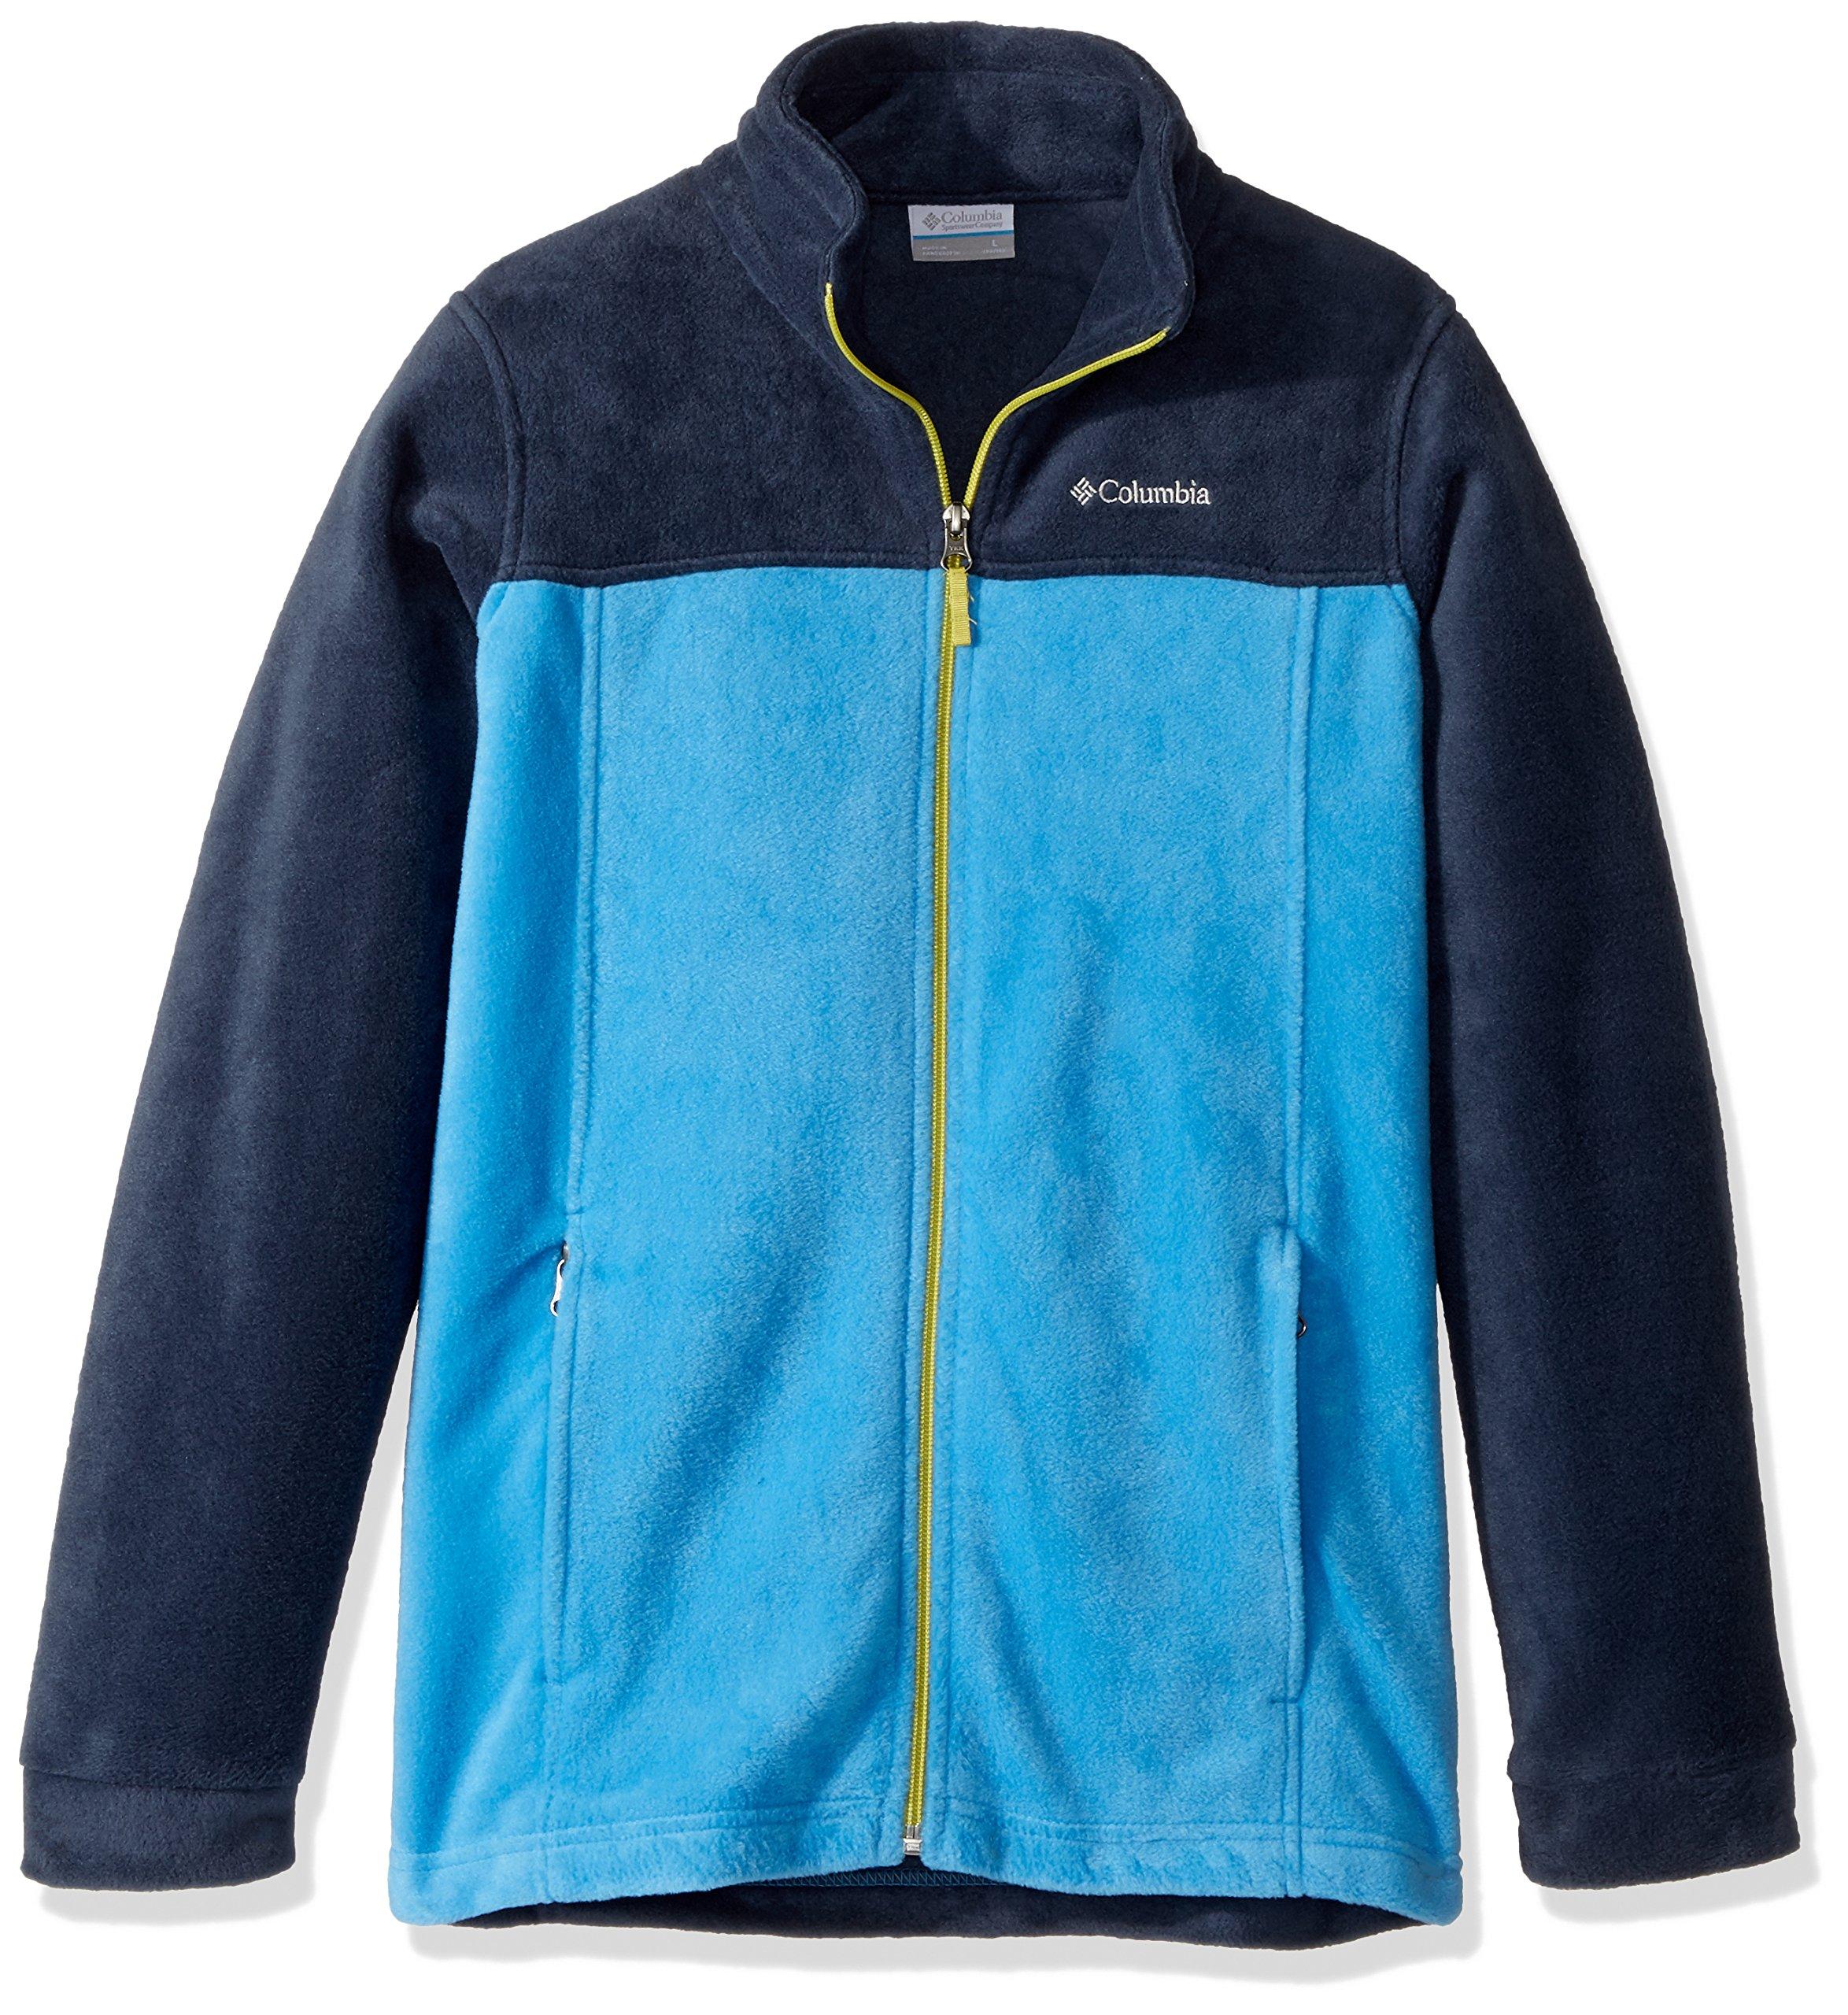 15bf9b882 Columbia Little Boy's Steens Mountain II Fleece Jacket, Peninsula, Coll  Navy, Ginkgo,